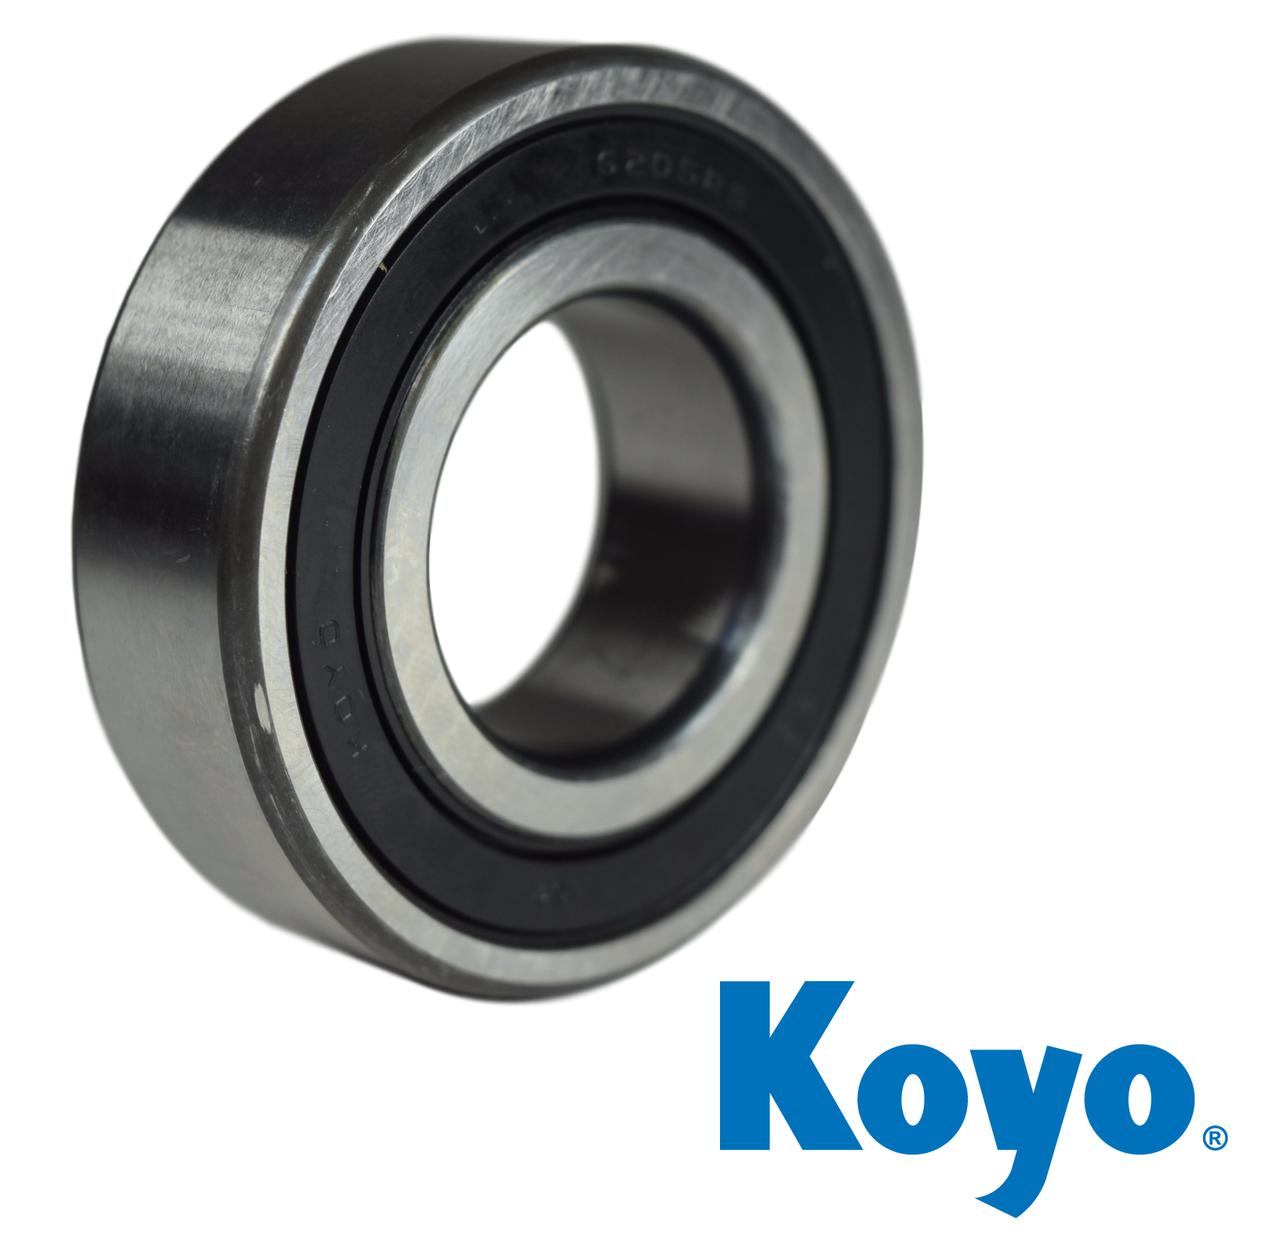 Koyo 6205-2RSC3 Radial Ball Bearing 25X52X15 Image